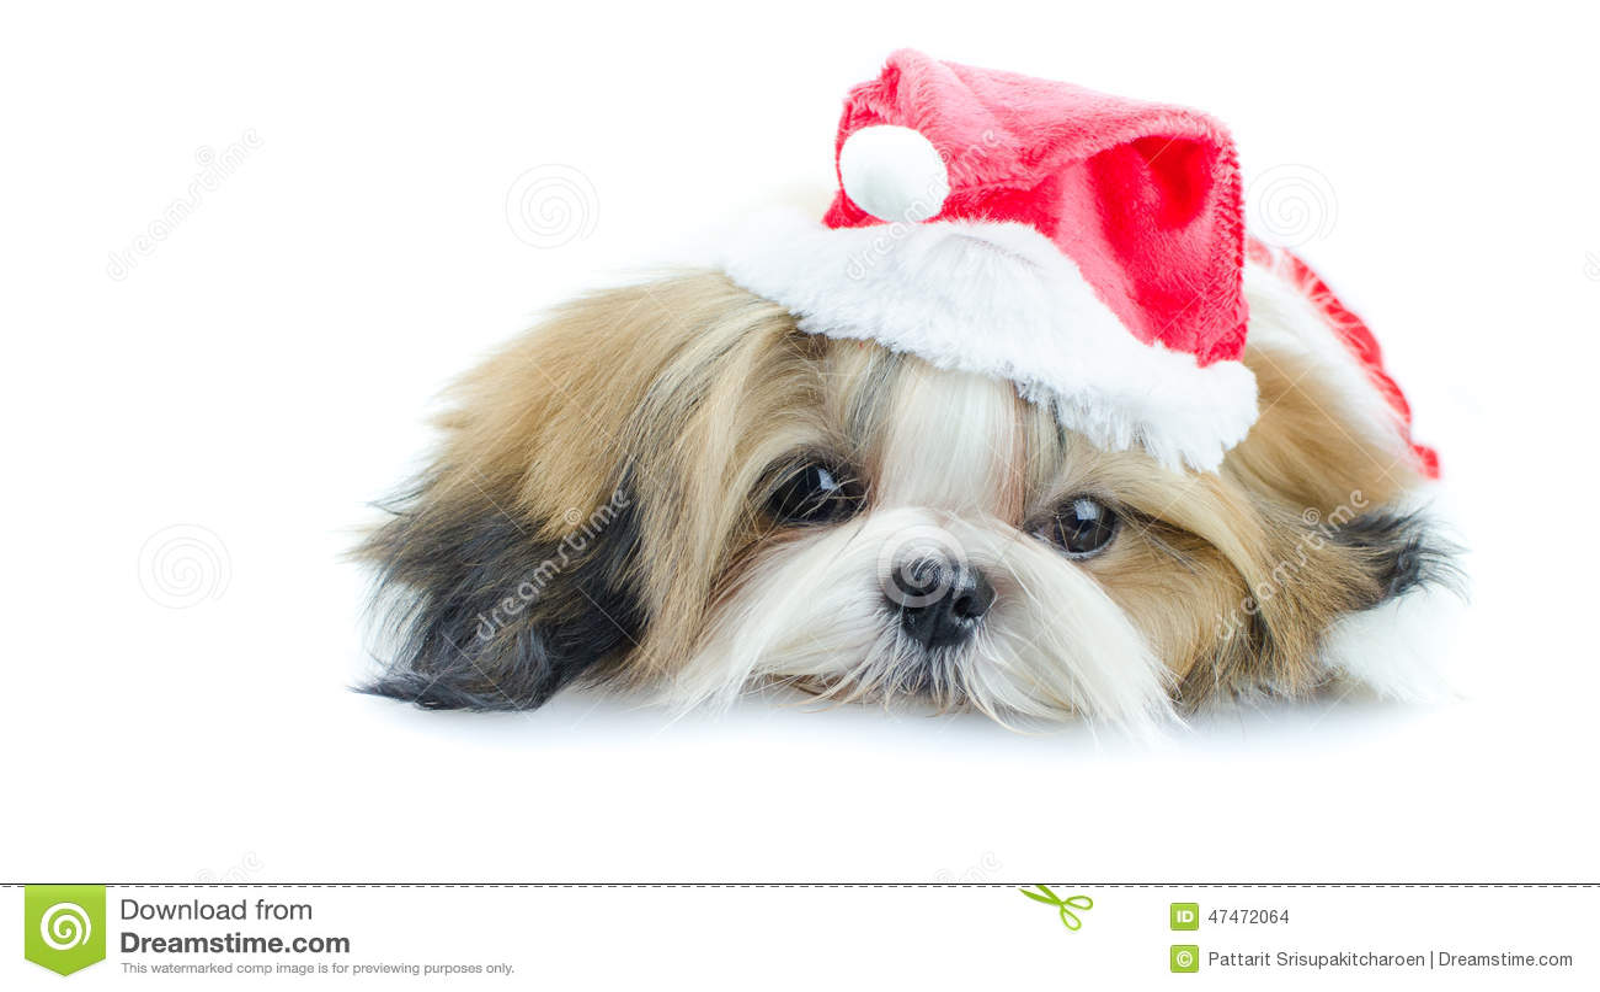 Cute Shih Tzu Puppies Wallpaper Cute Shih Tzu Puppy In Christmas Theme Stock Photo Image